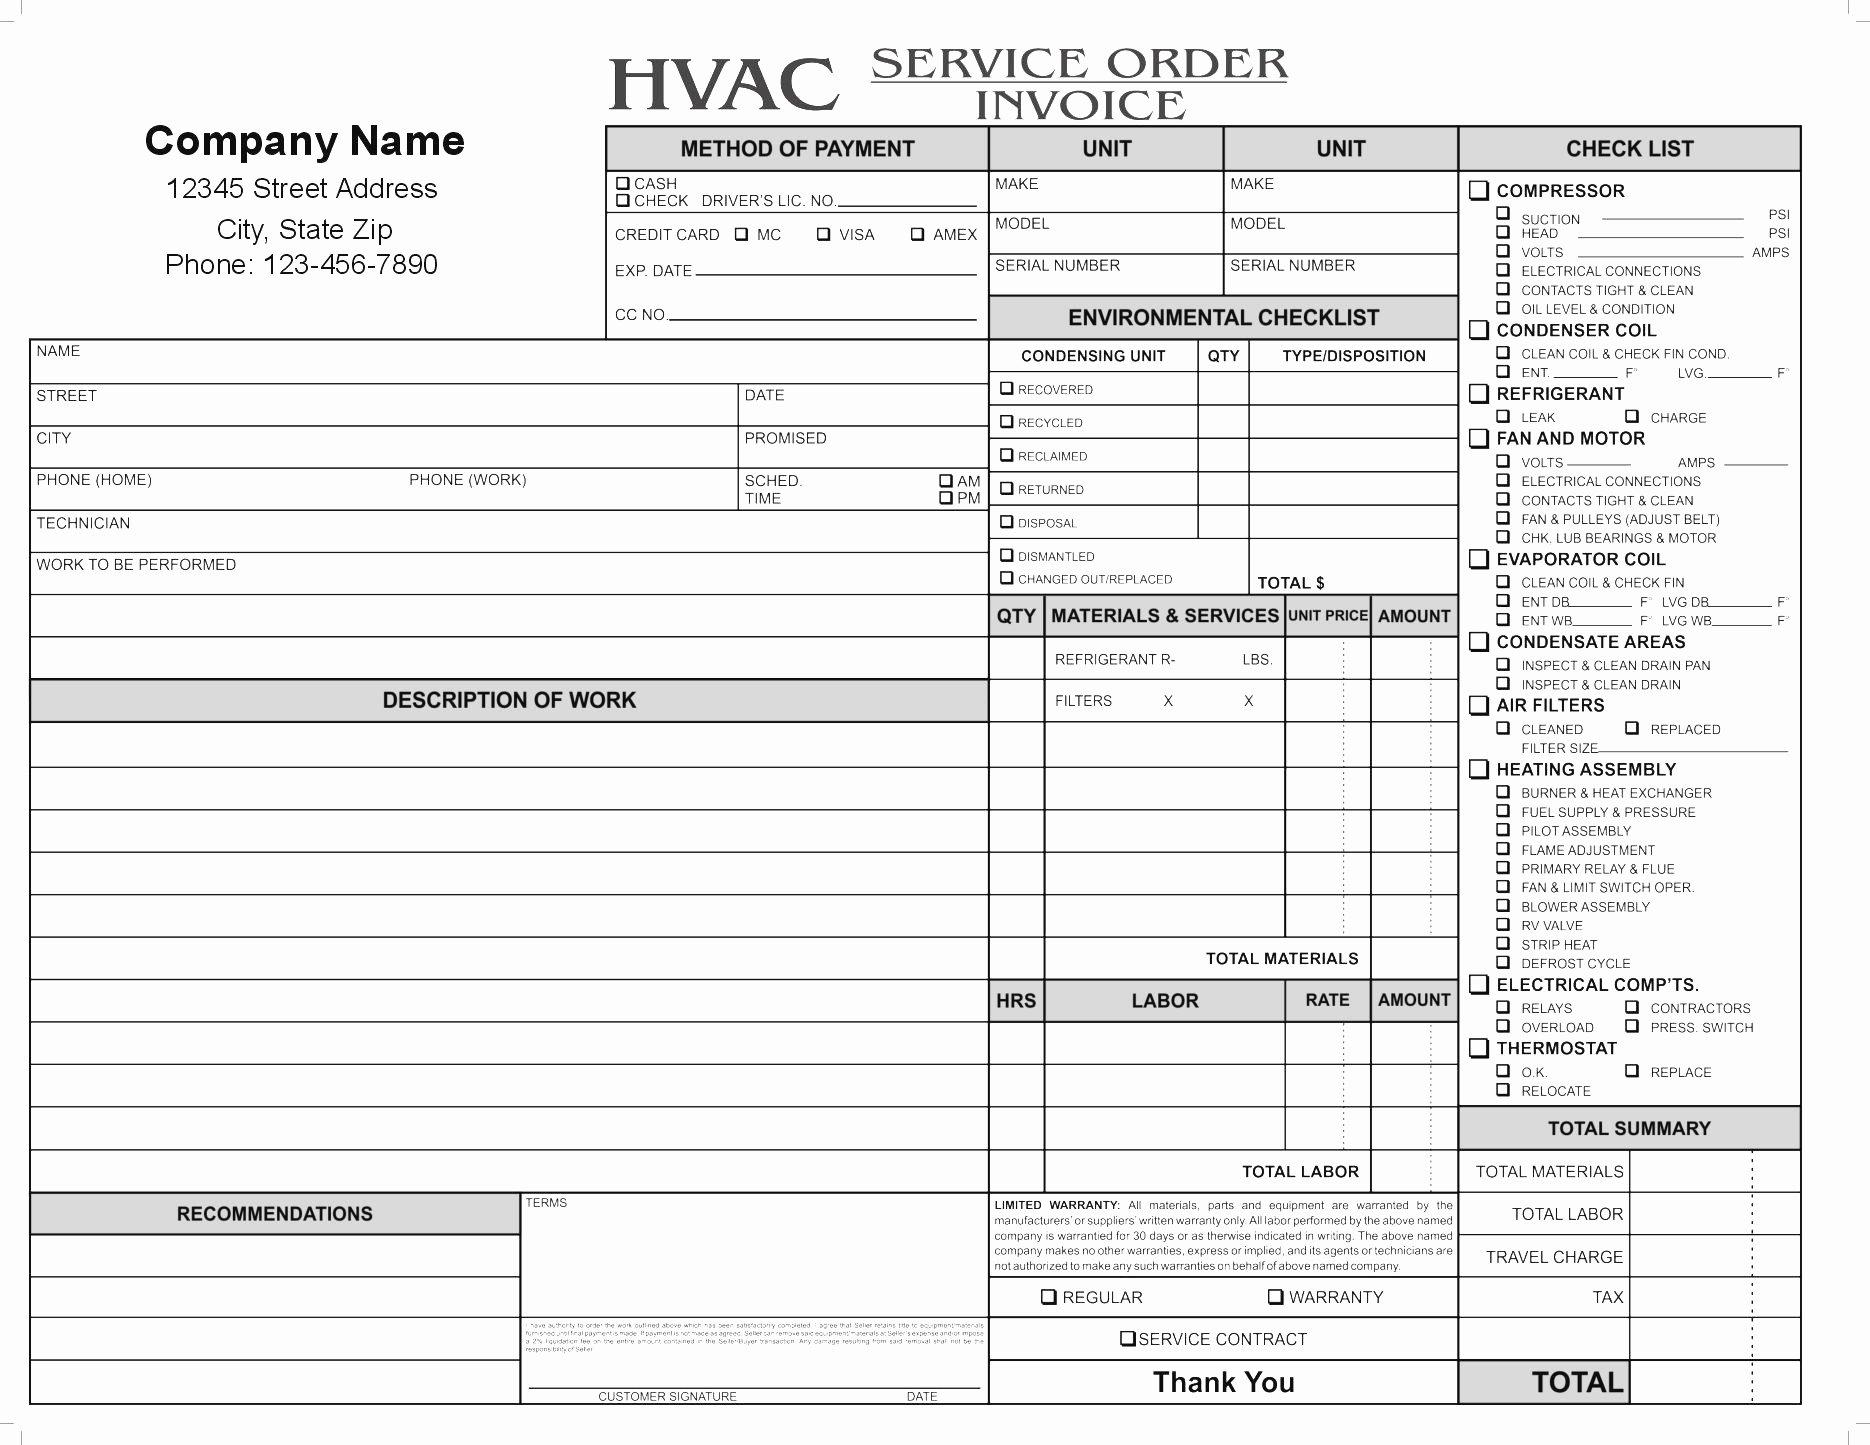 Hvac Service order Invoice Template Elegant Hvac Service order Invoice Template Ten Lessons that Will